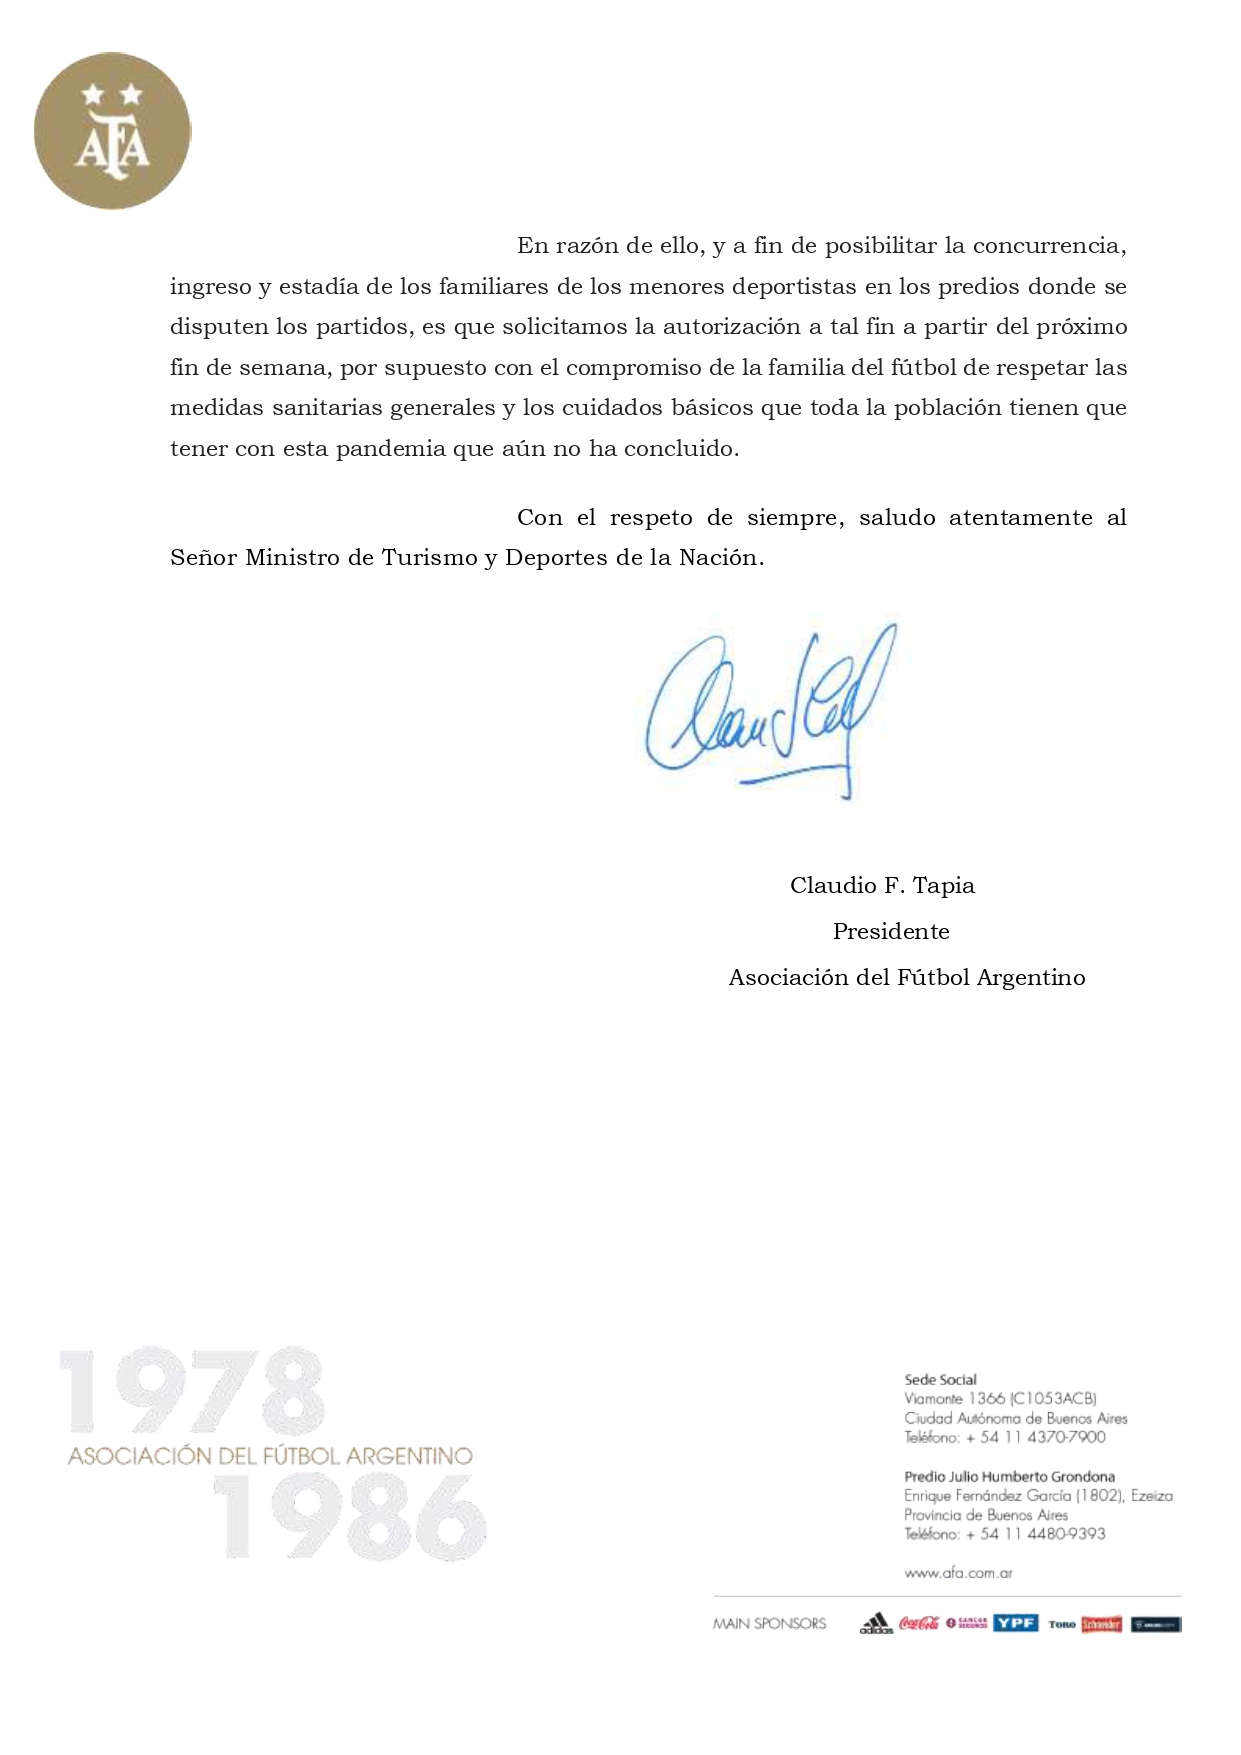 NOTA AFA MINISTERIO TUR Y DEP_page-0002